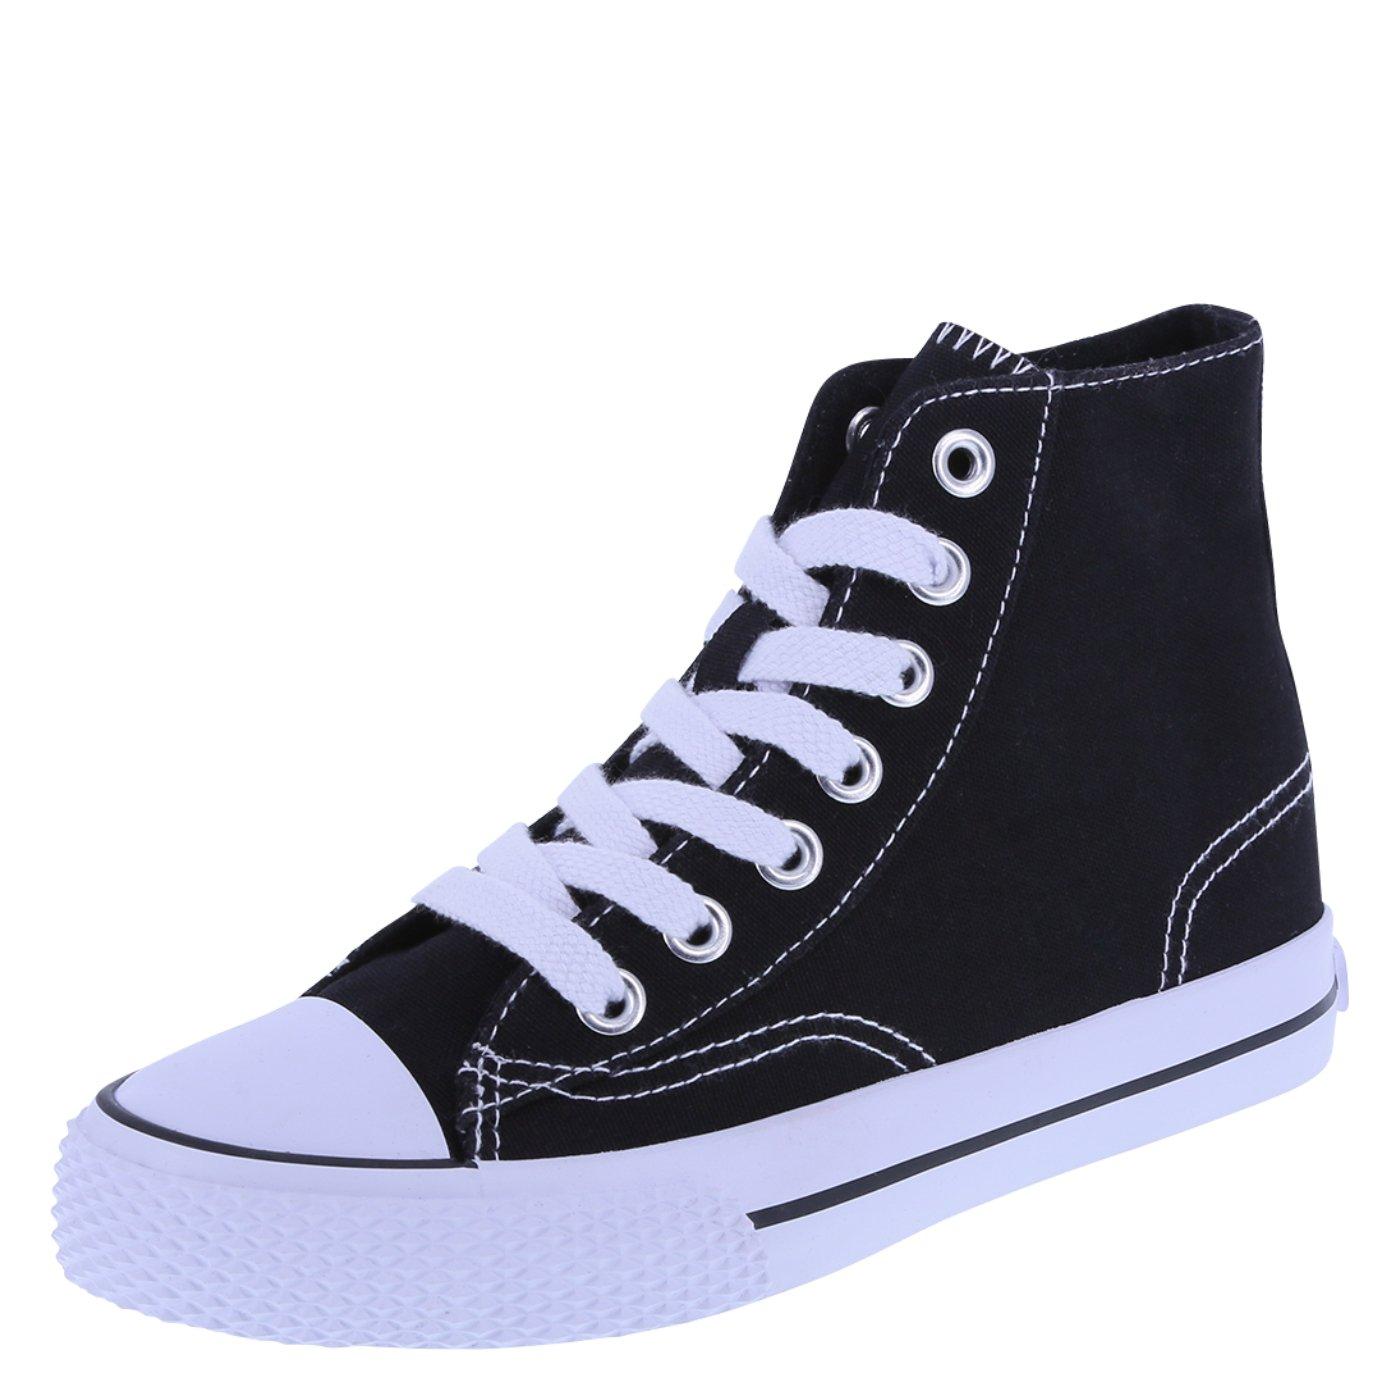 Airwalk Kids Black White Kids Legacee Sneaker High-Top 2.5 Regular 170371025